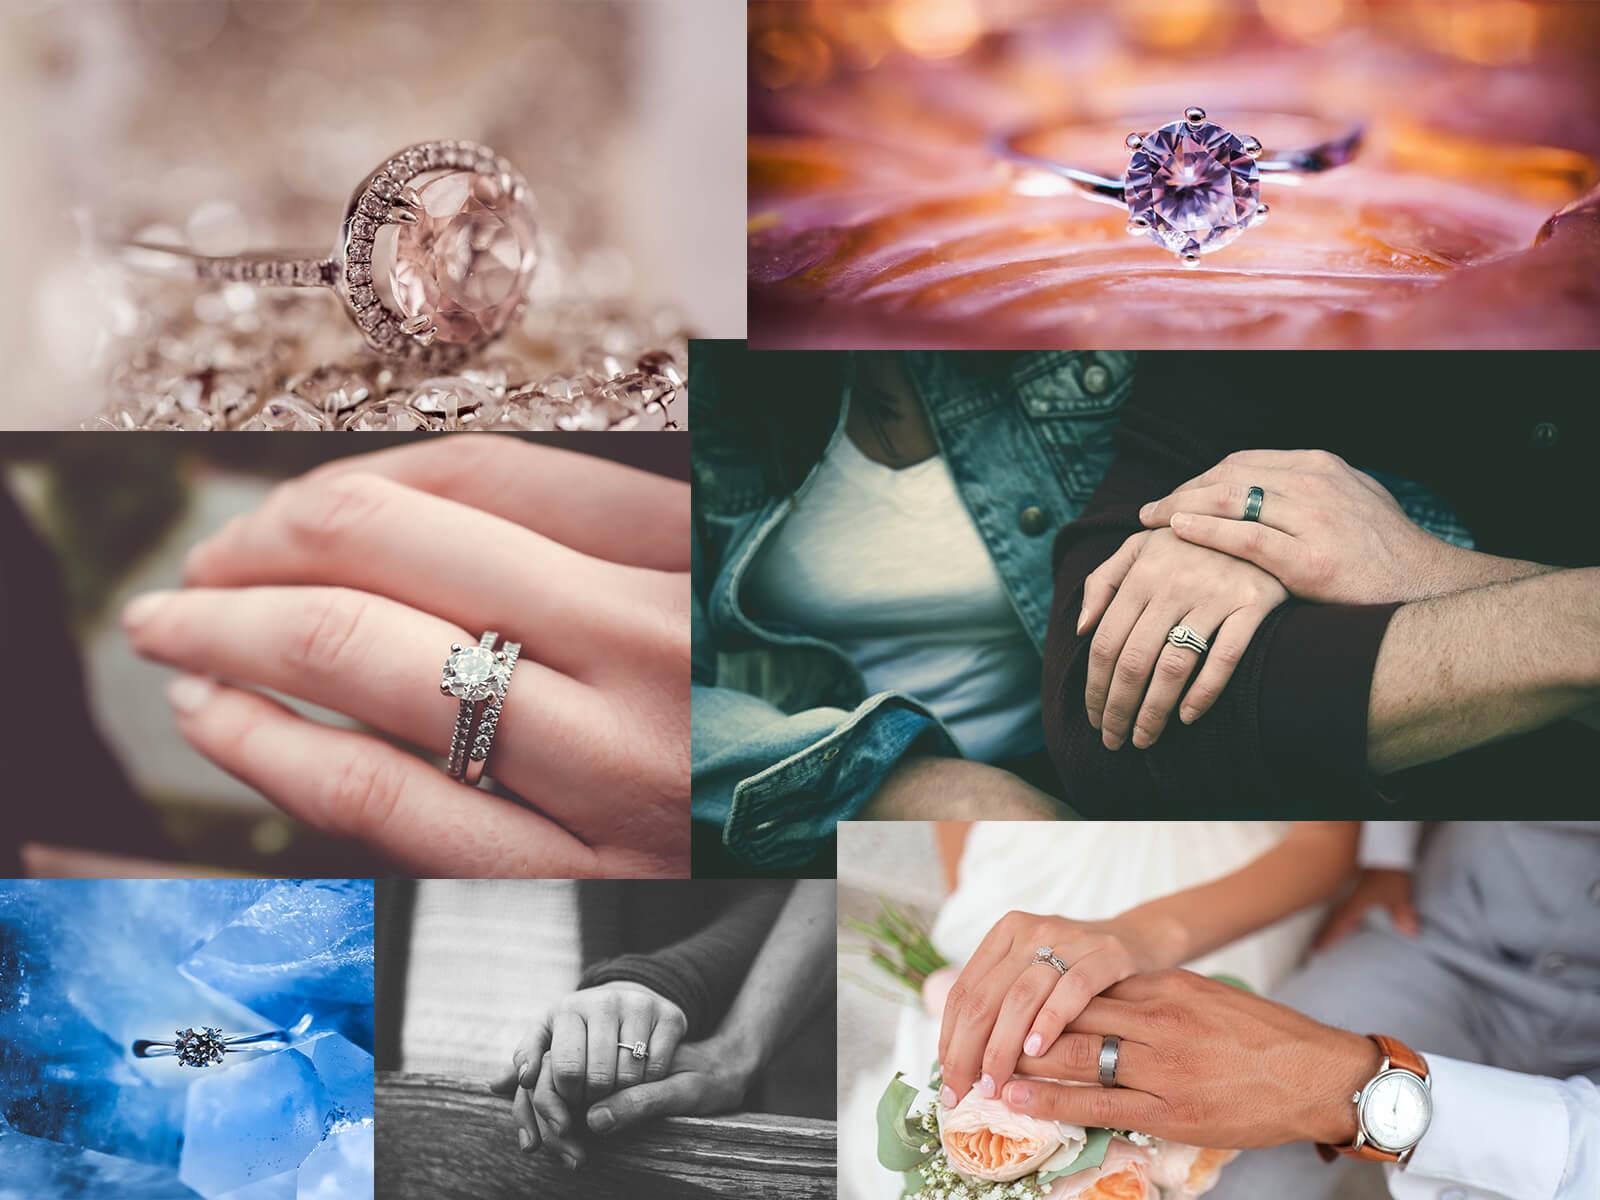 Melbourne diamond company wholesale diamonds